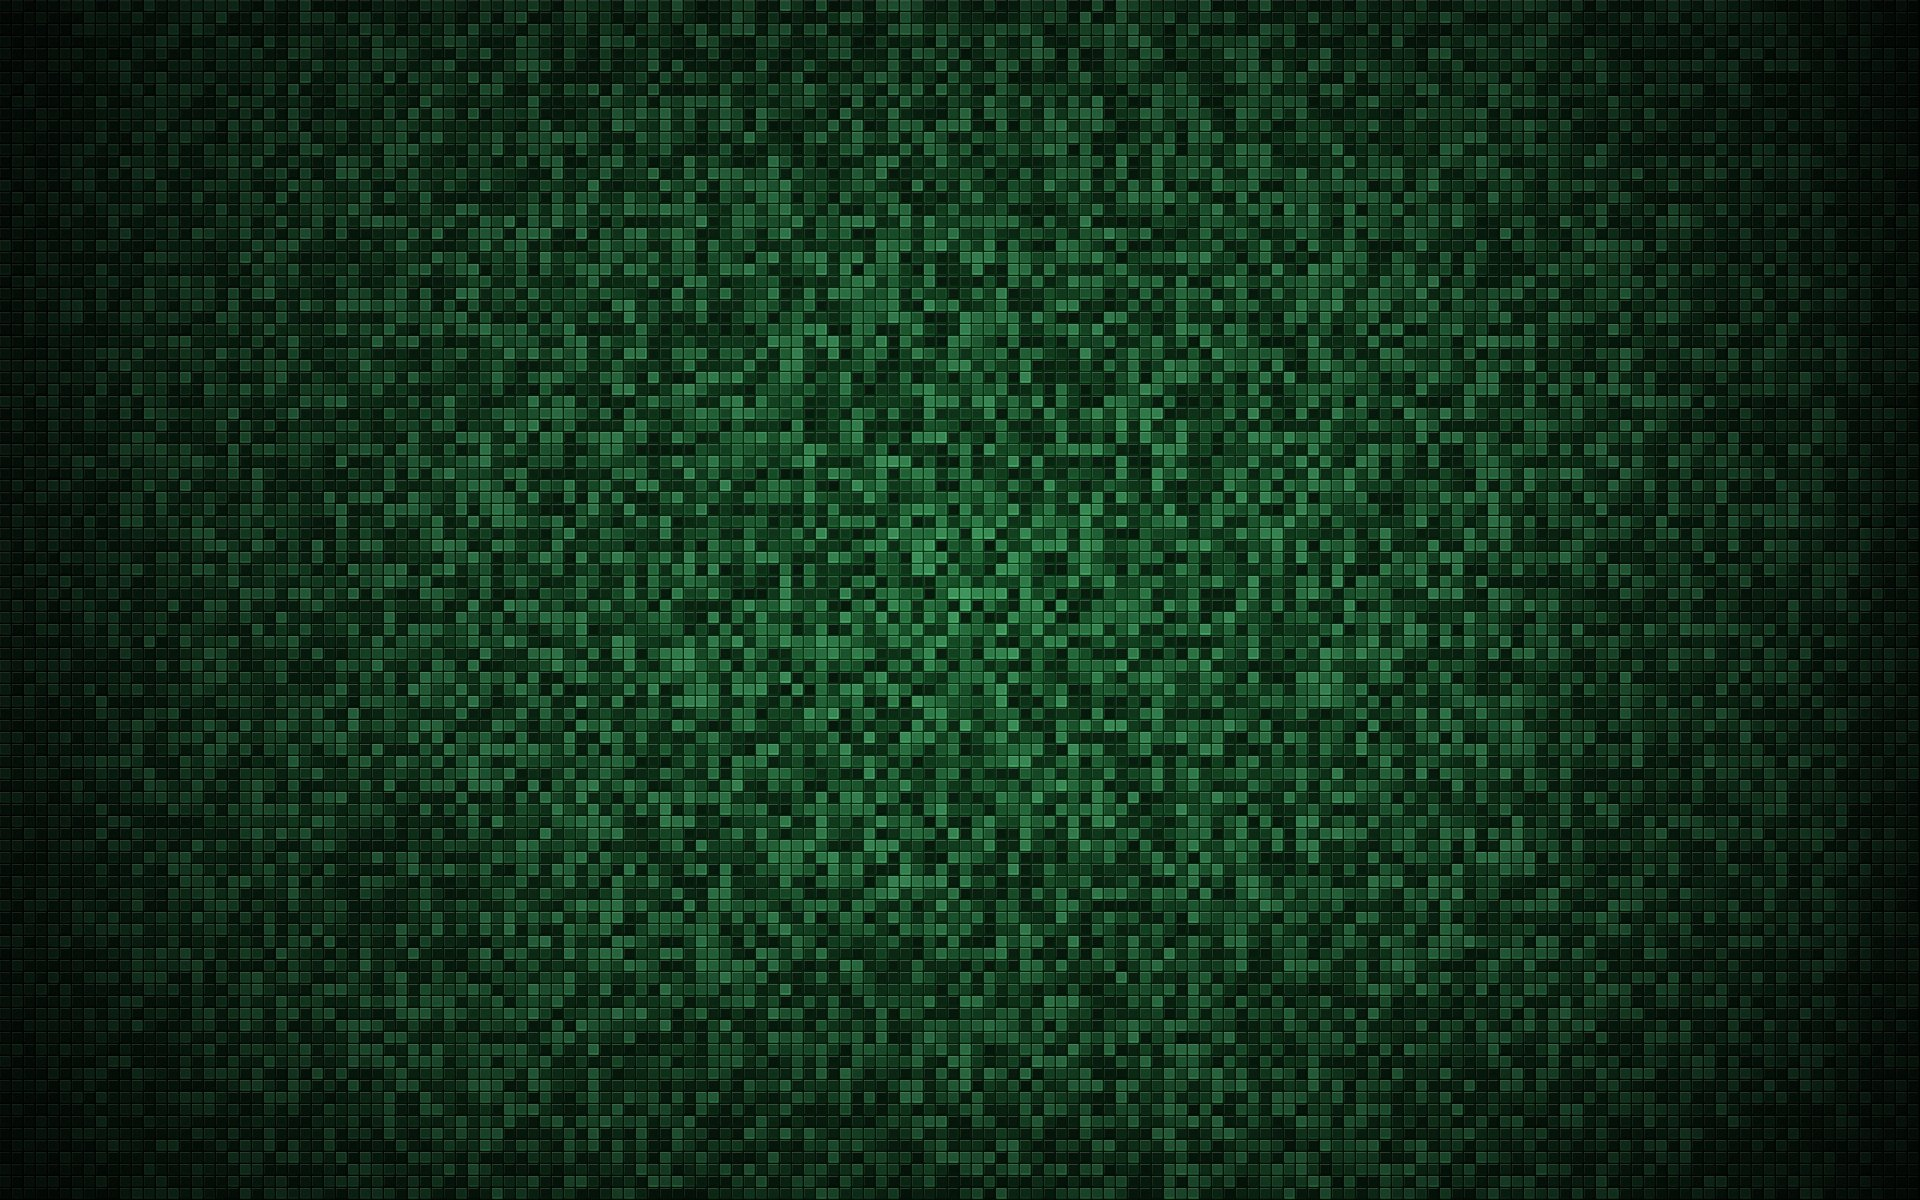 Patrón - Square  Verde Fondo de Pantalla